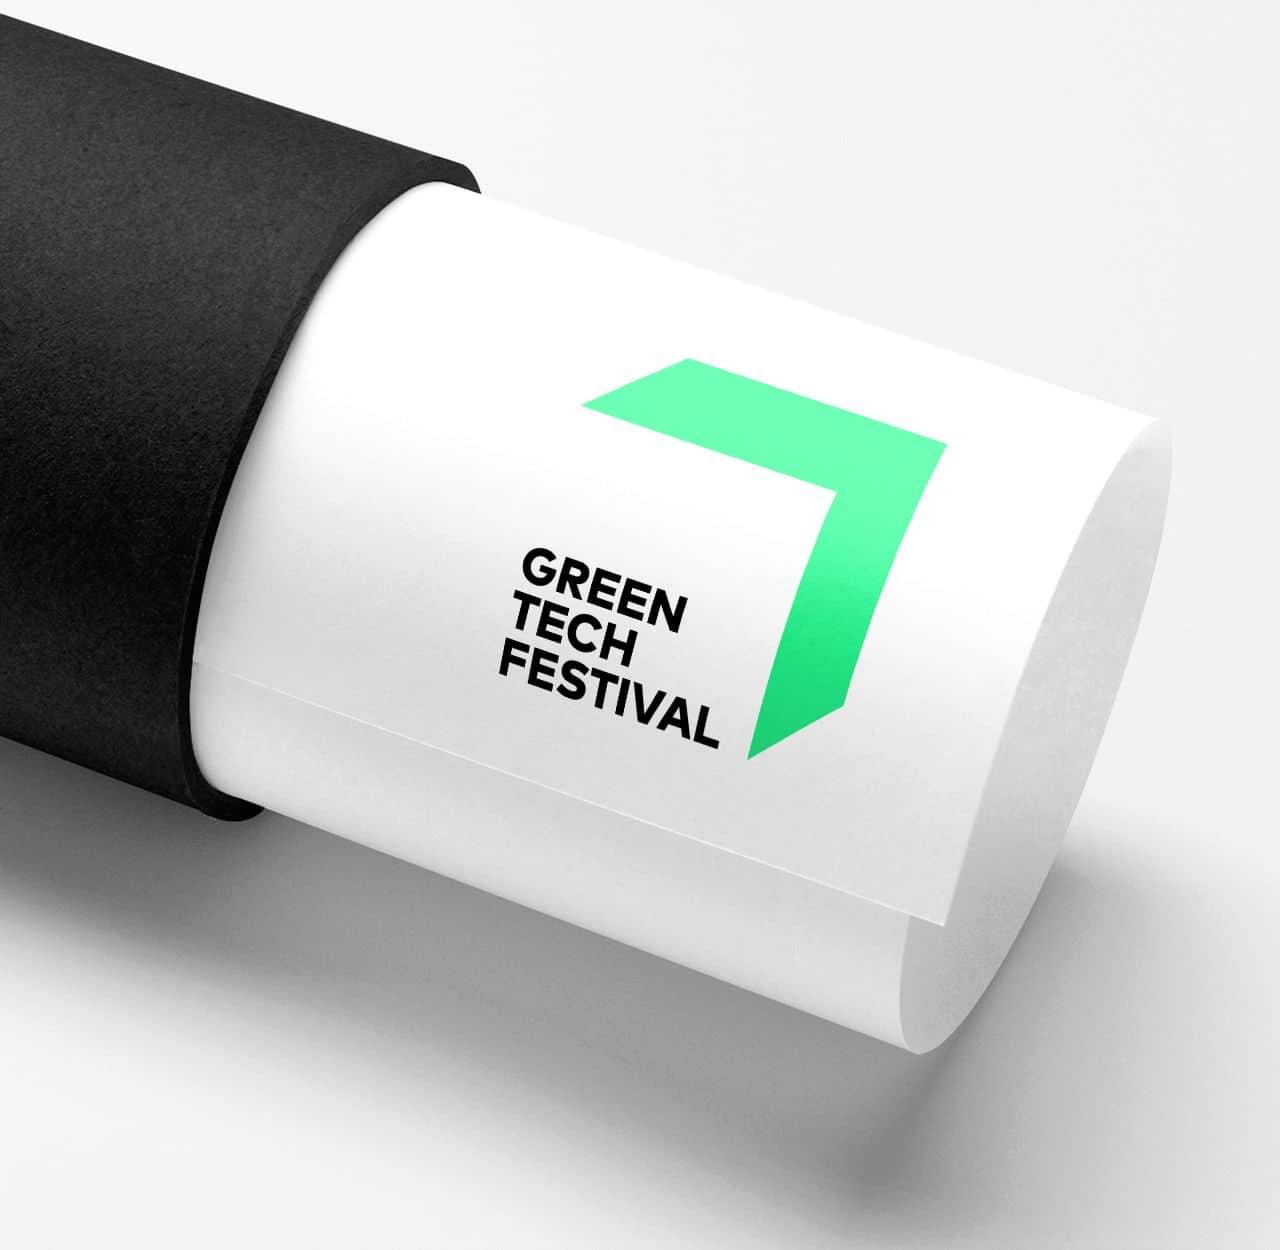 Greentech Festival logo